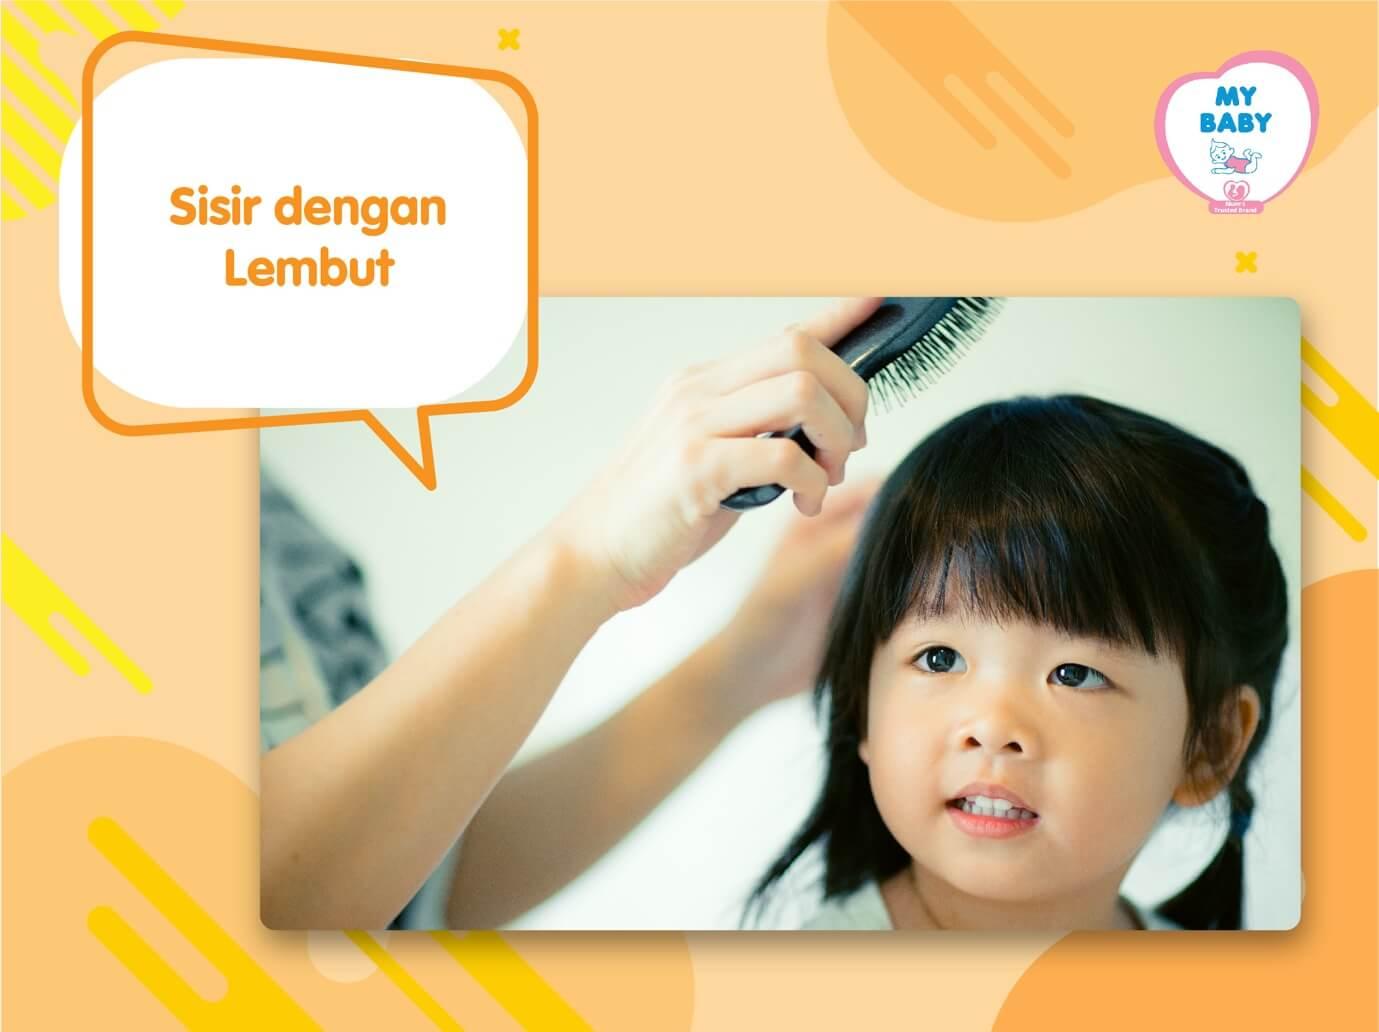 MYBABY - 4 Cara Merawat Rambut Anak Perempuan Tanpa Berantem